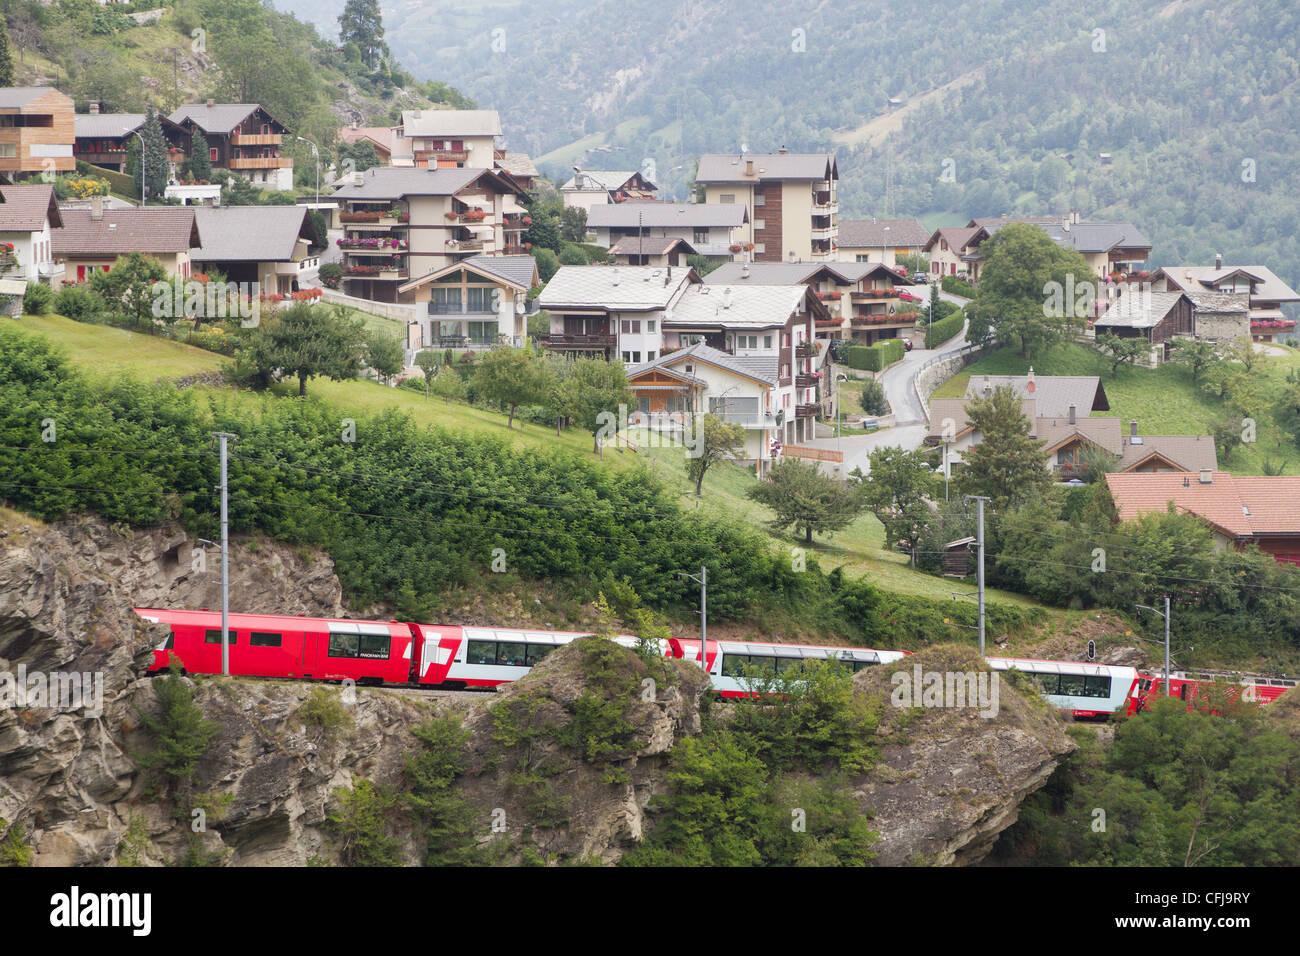 Glacier express train passes village, Switzerland - Stock Image